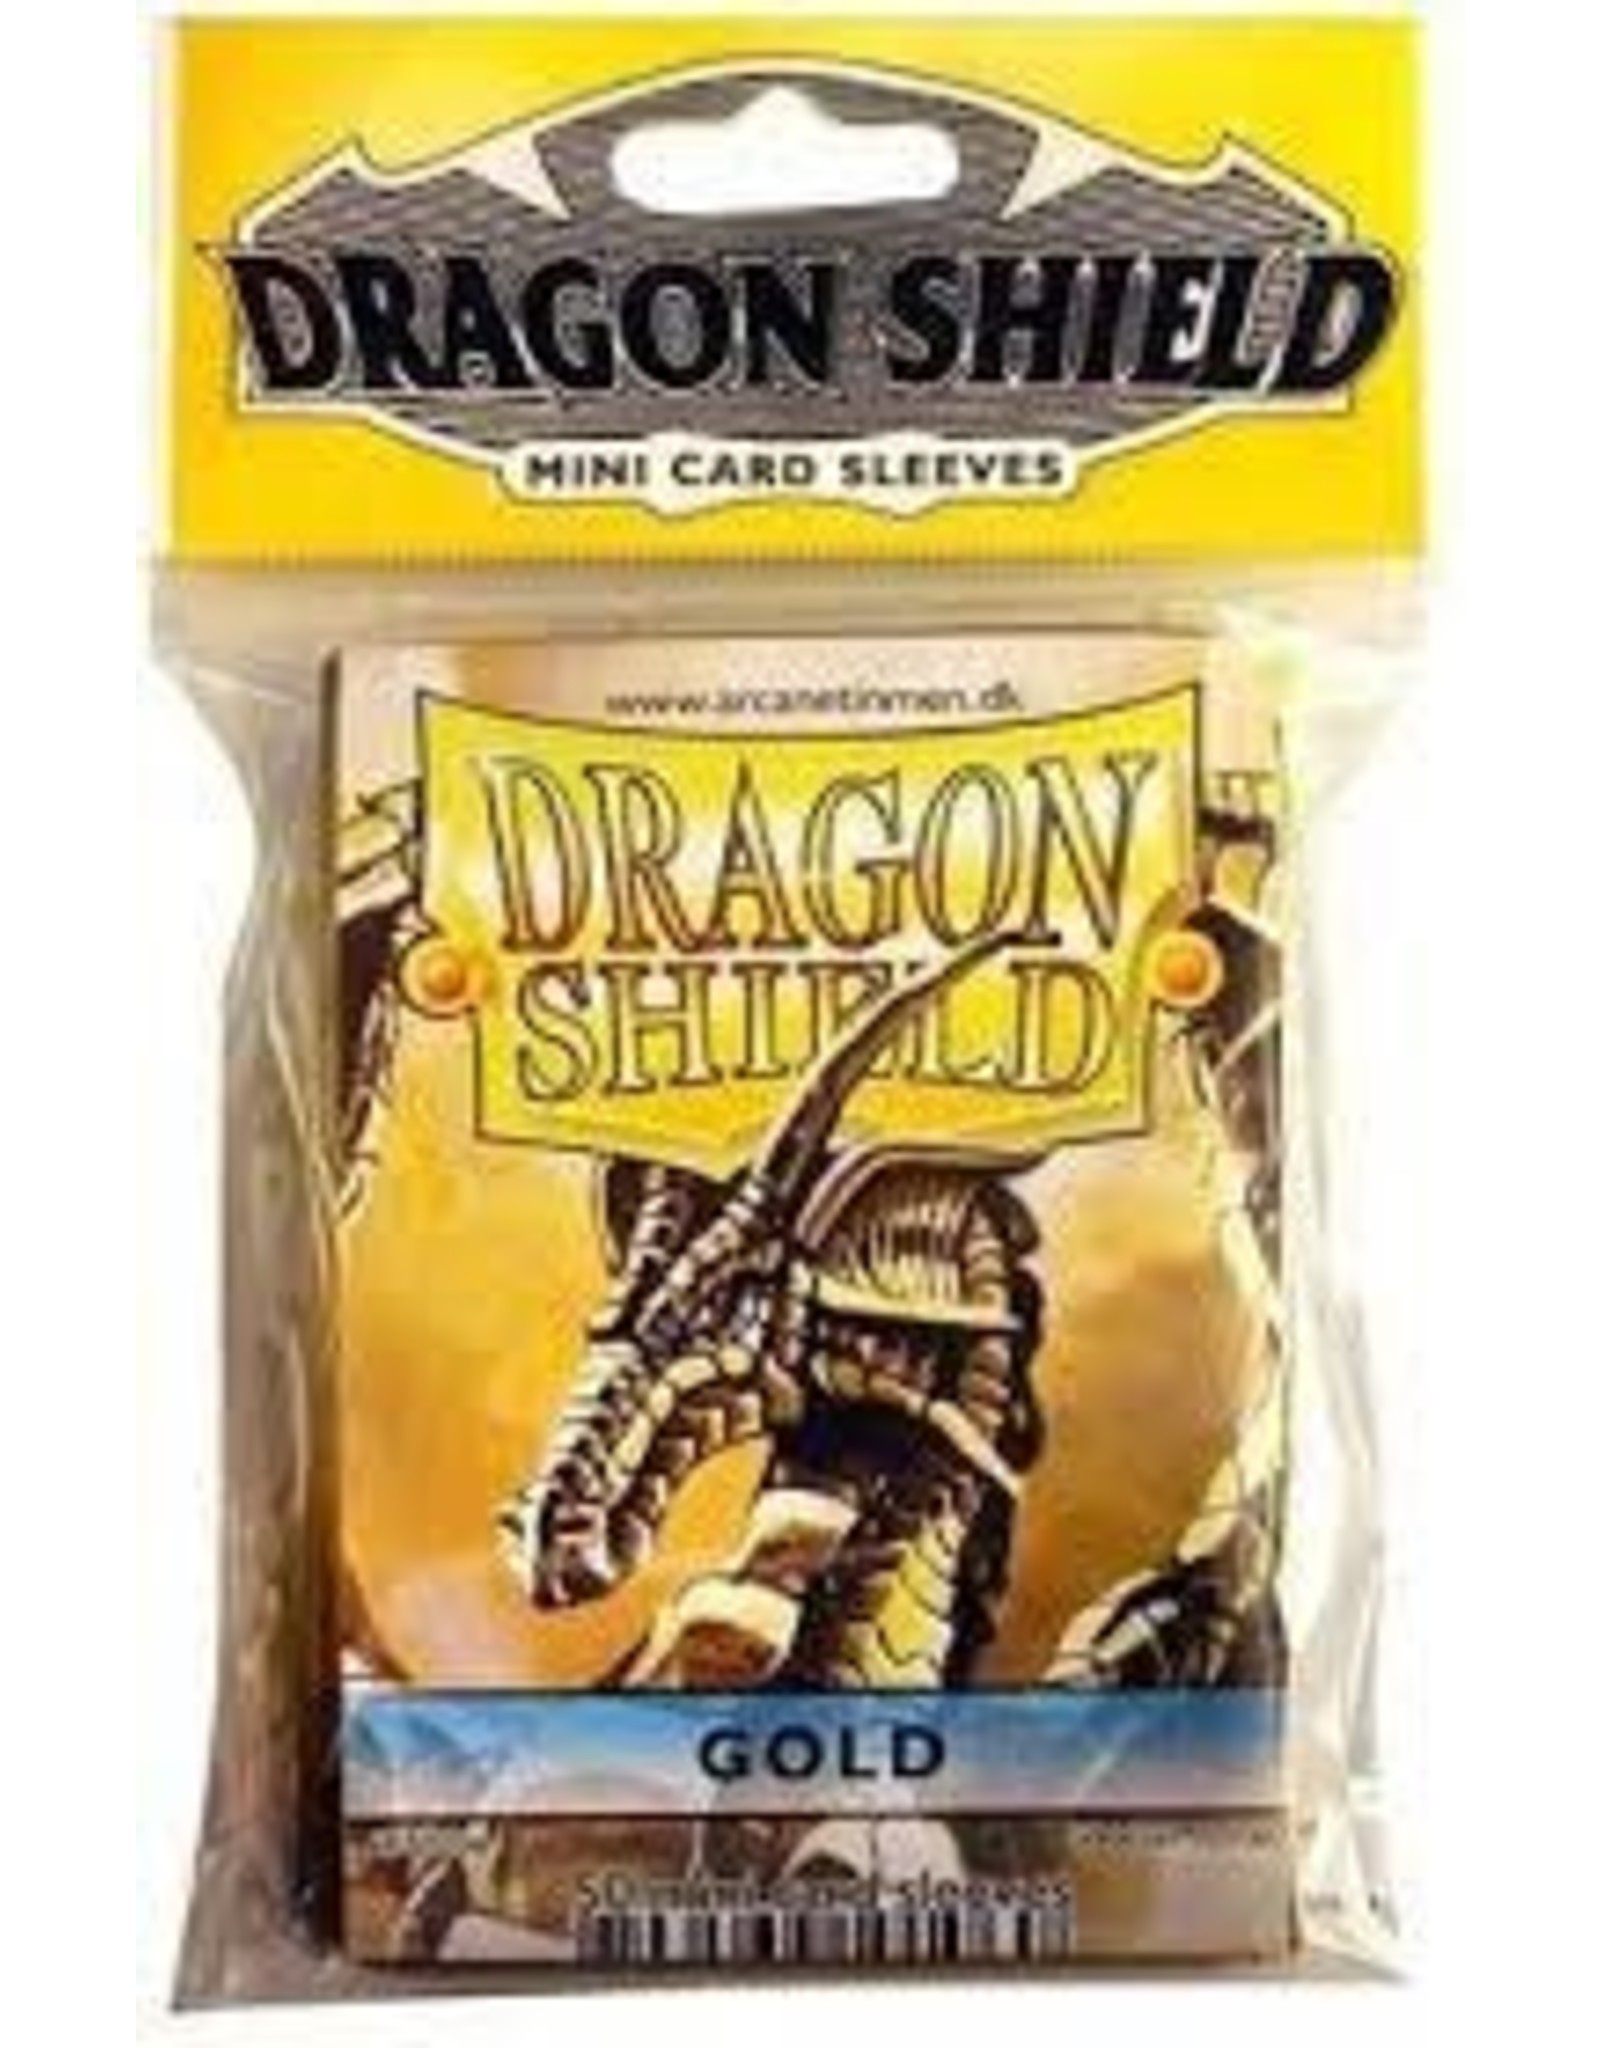 Dragon Shield Mini Sleeves - Gold (50 ct. in bag)